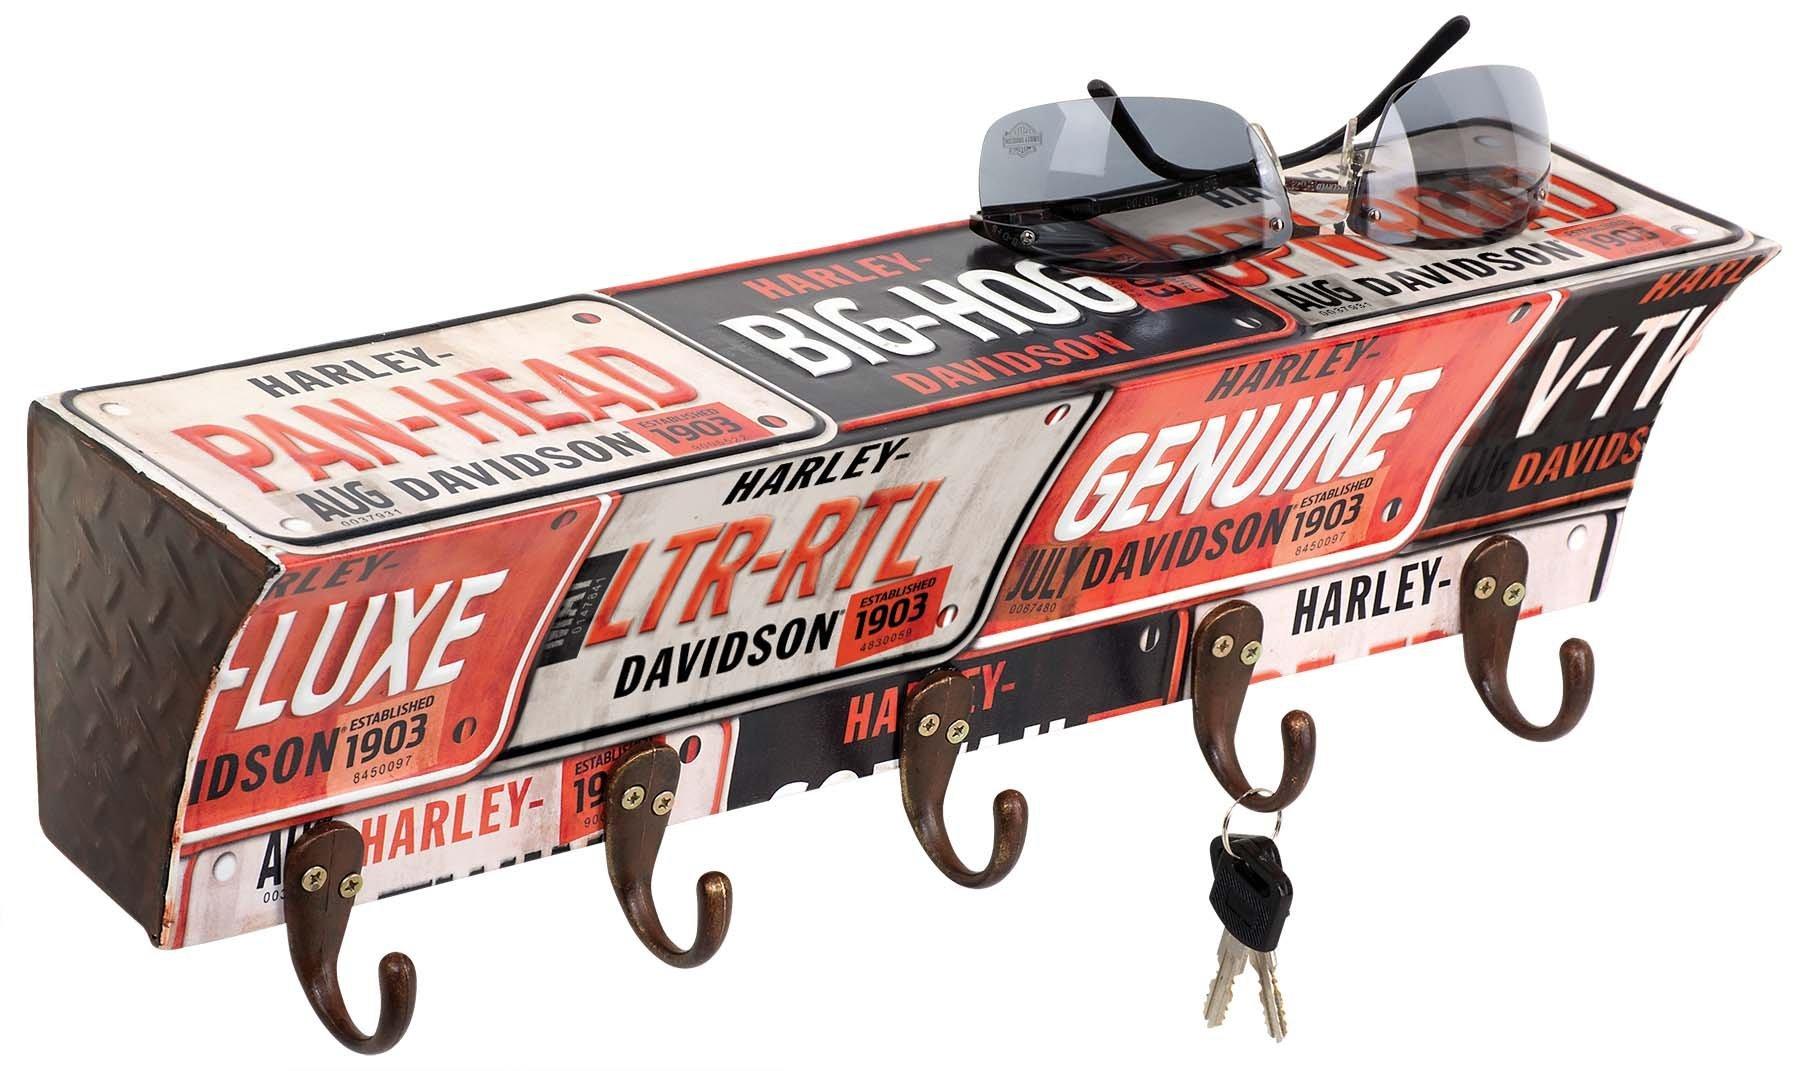 Harley-Davidson License Plate Key Rack | 5 Hooks